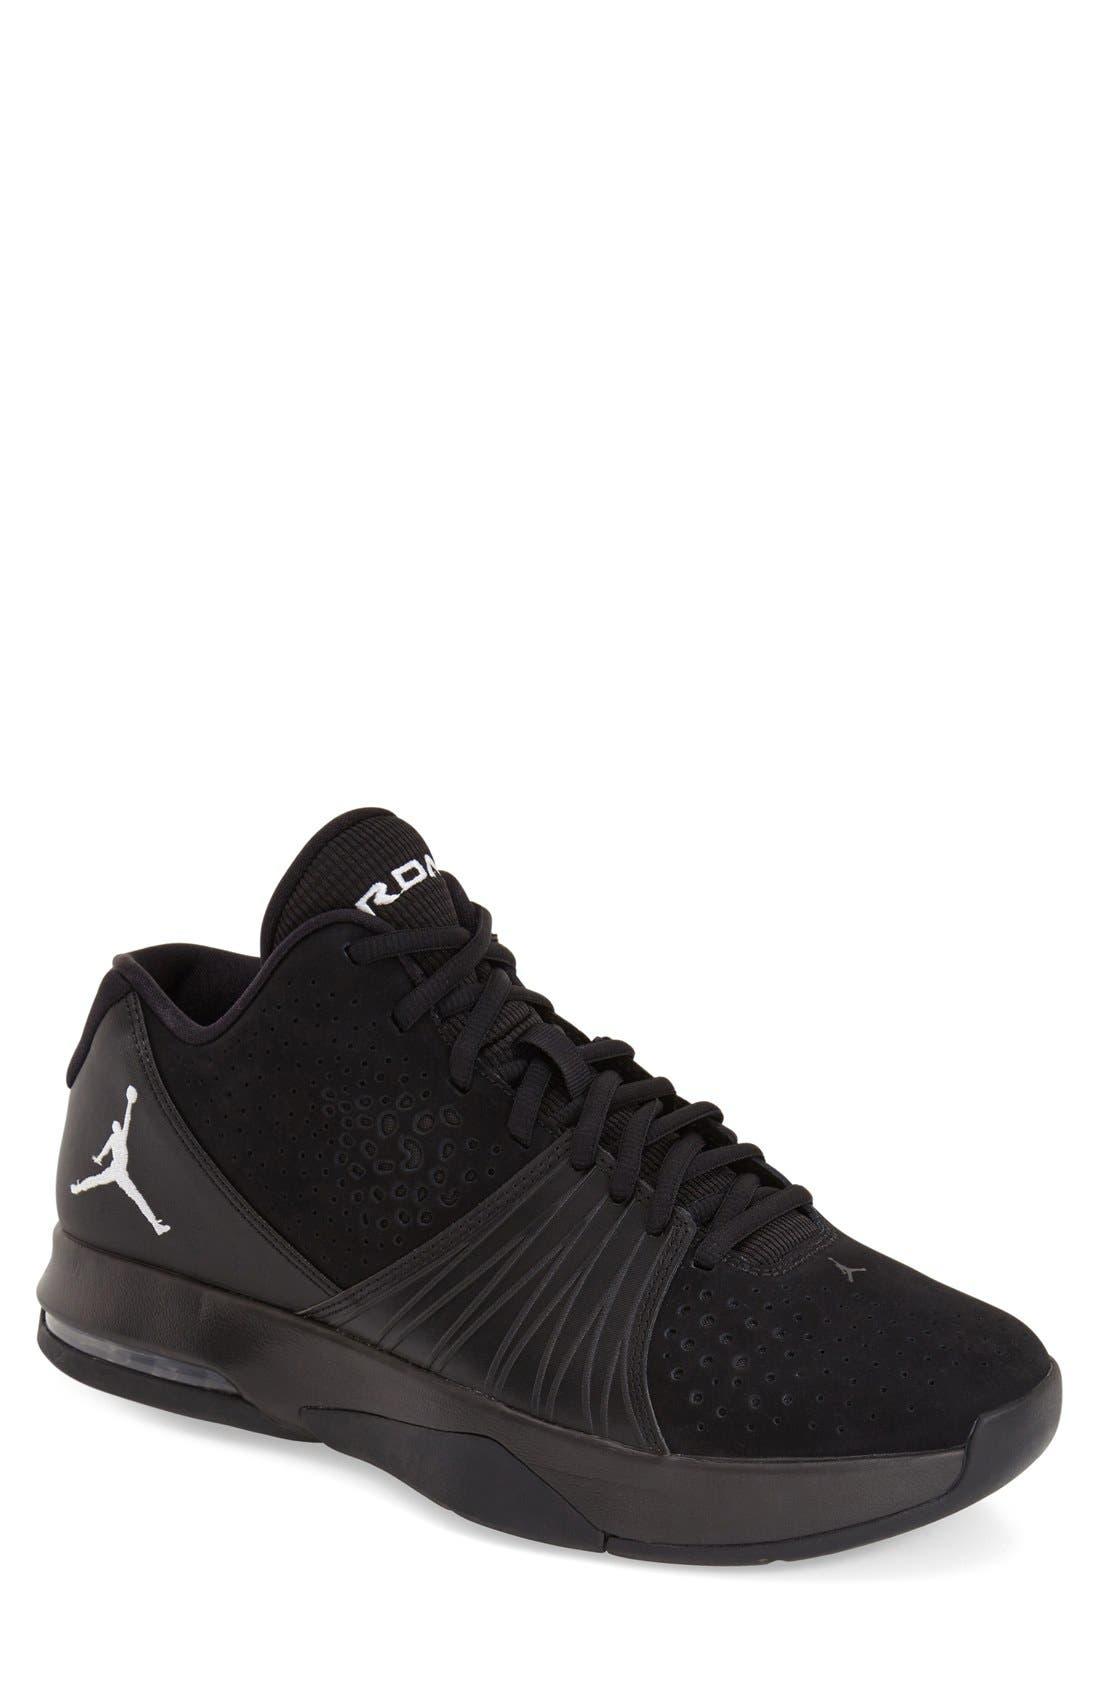 Main Image - Nike 'Air Jordan 5AM' Training Shoe (Men)